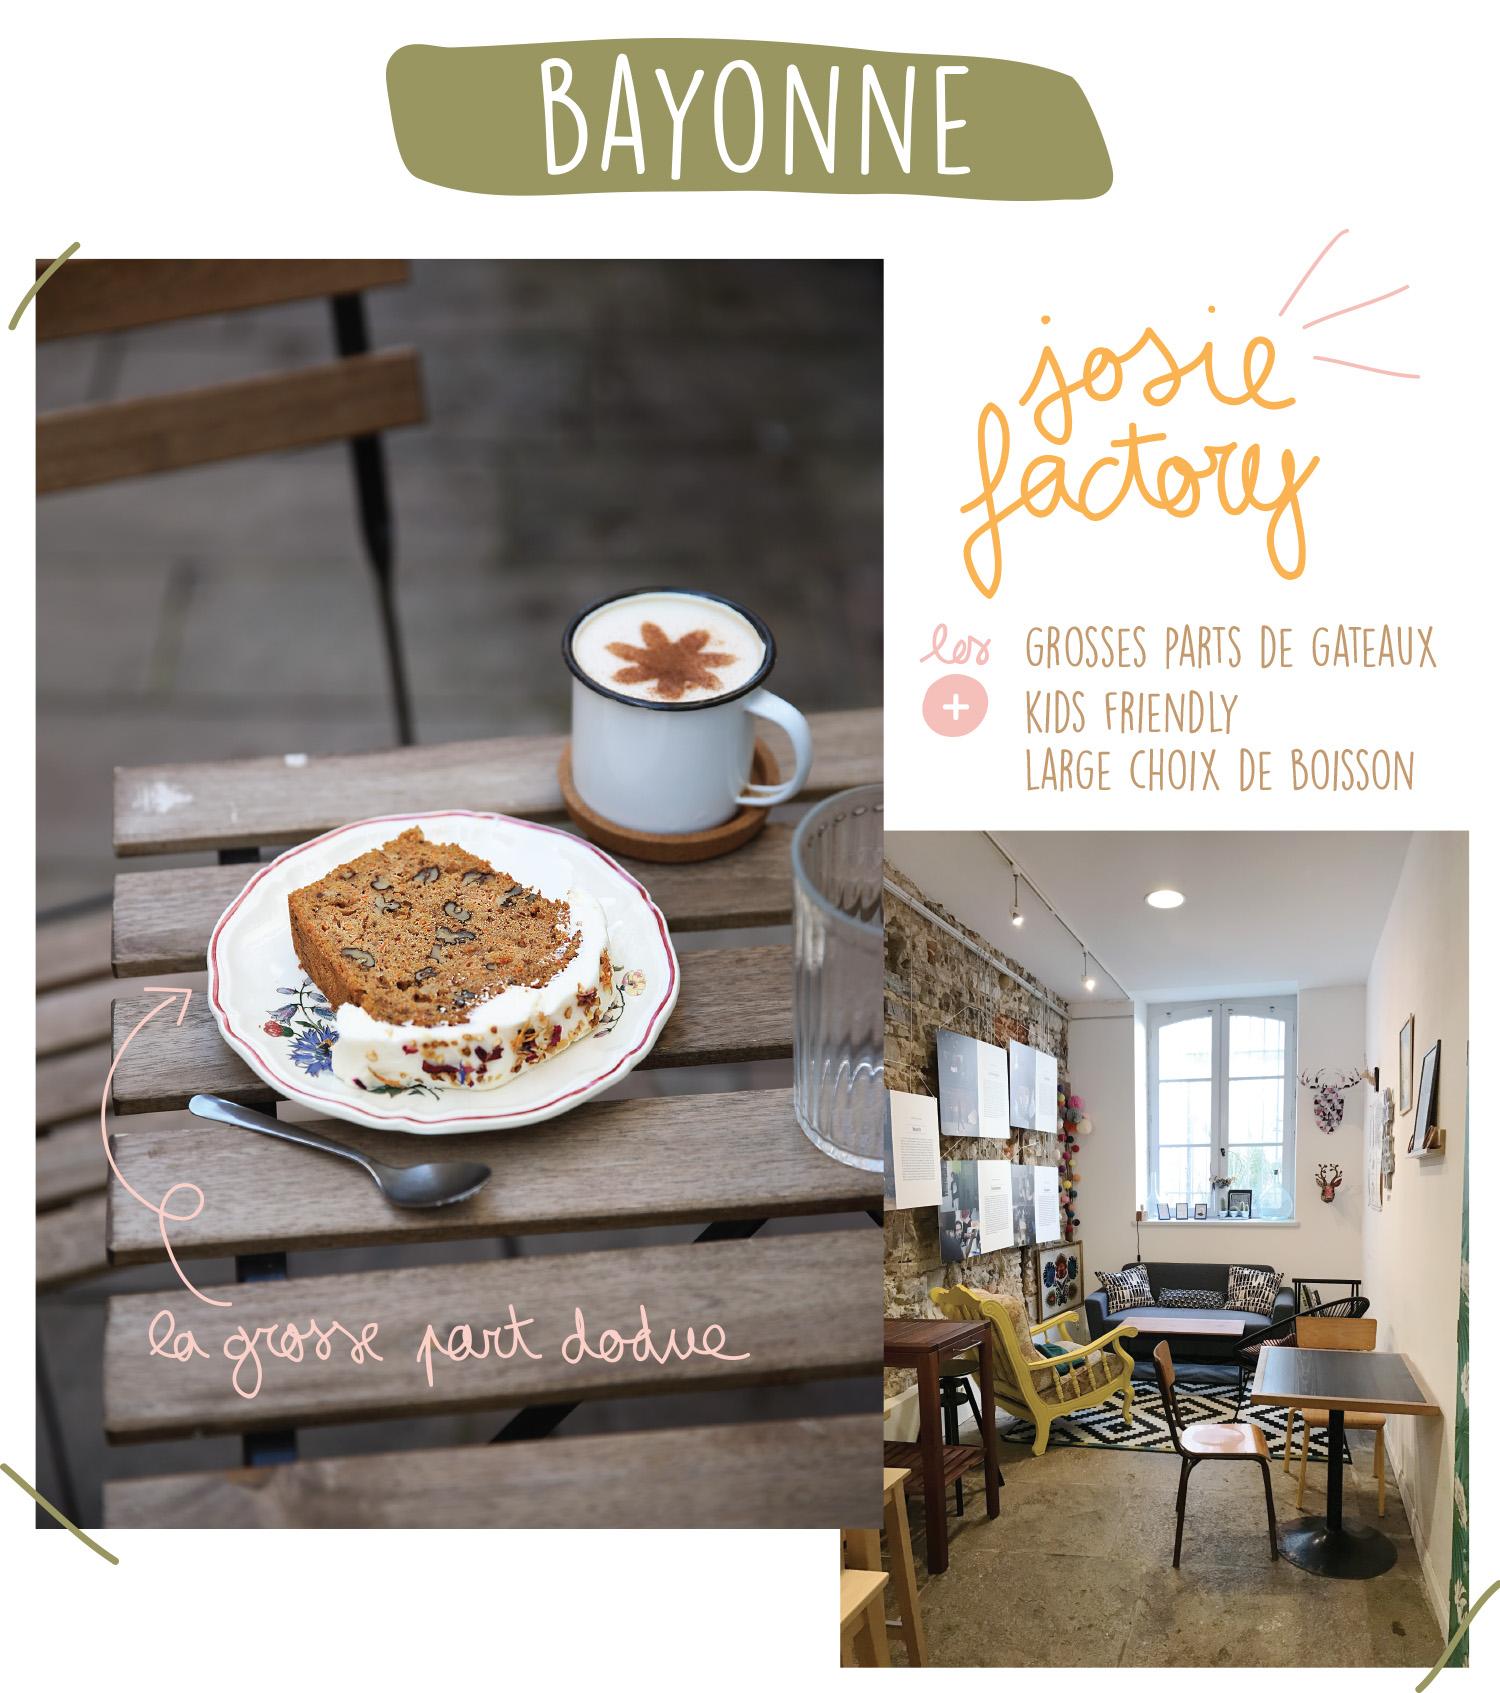 Bonne Adresse Bayonne - Josie Factory - Petits Béguins